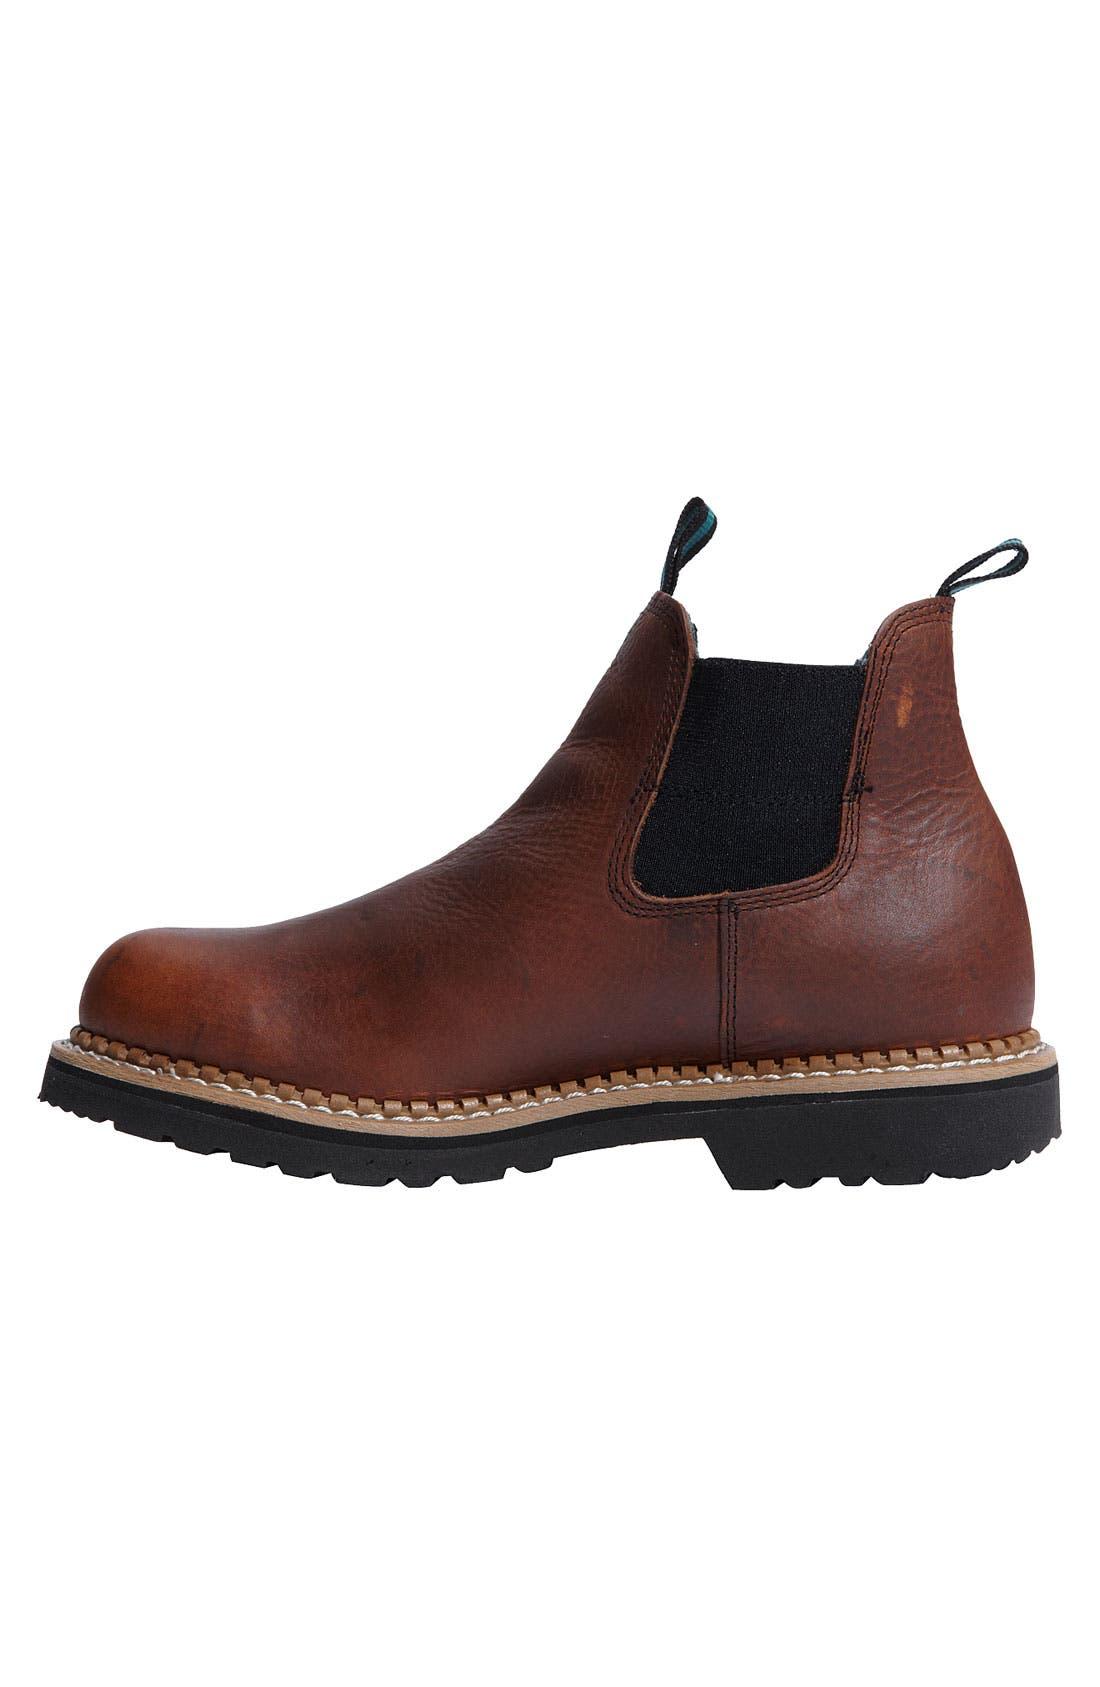 Alternate Image 3  - Georgia Boot 'Romeo' Waterproof Boot